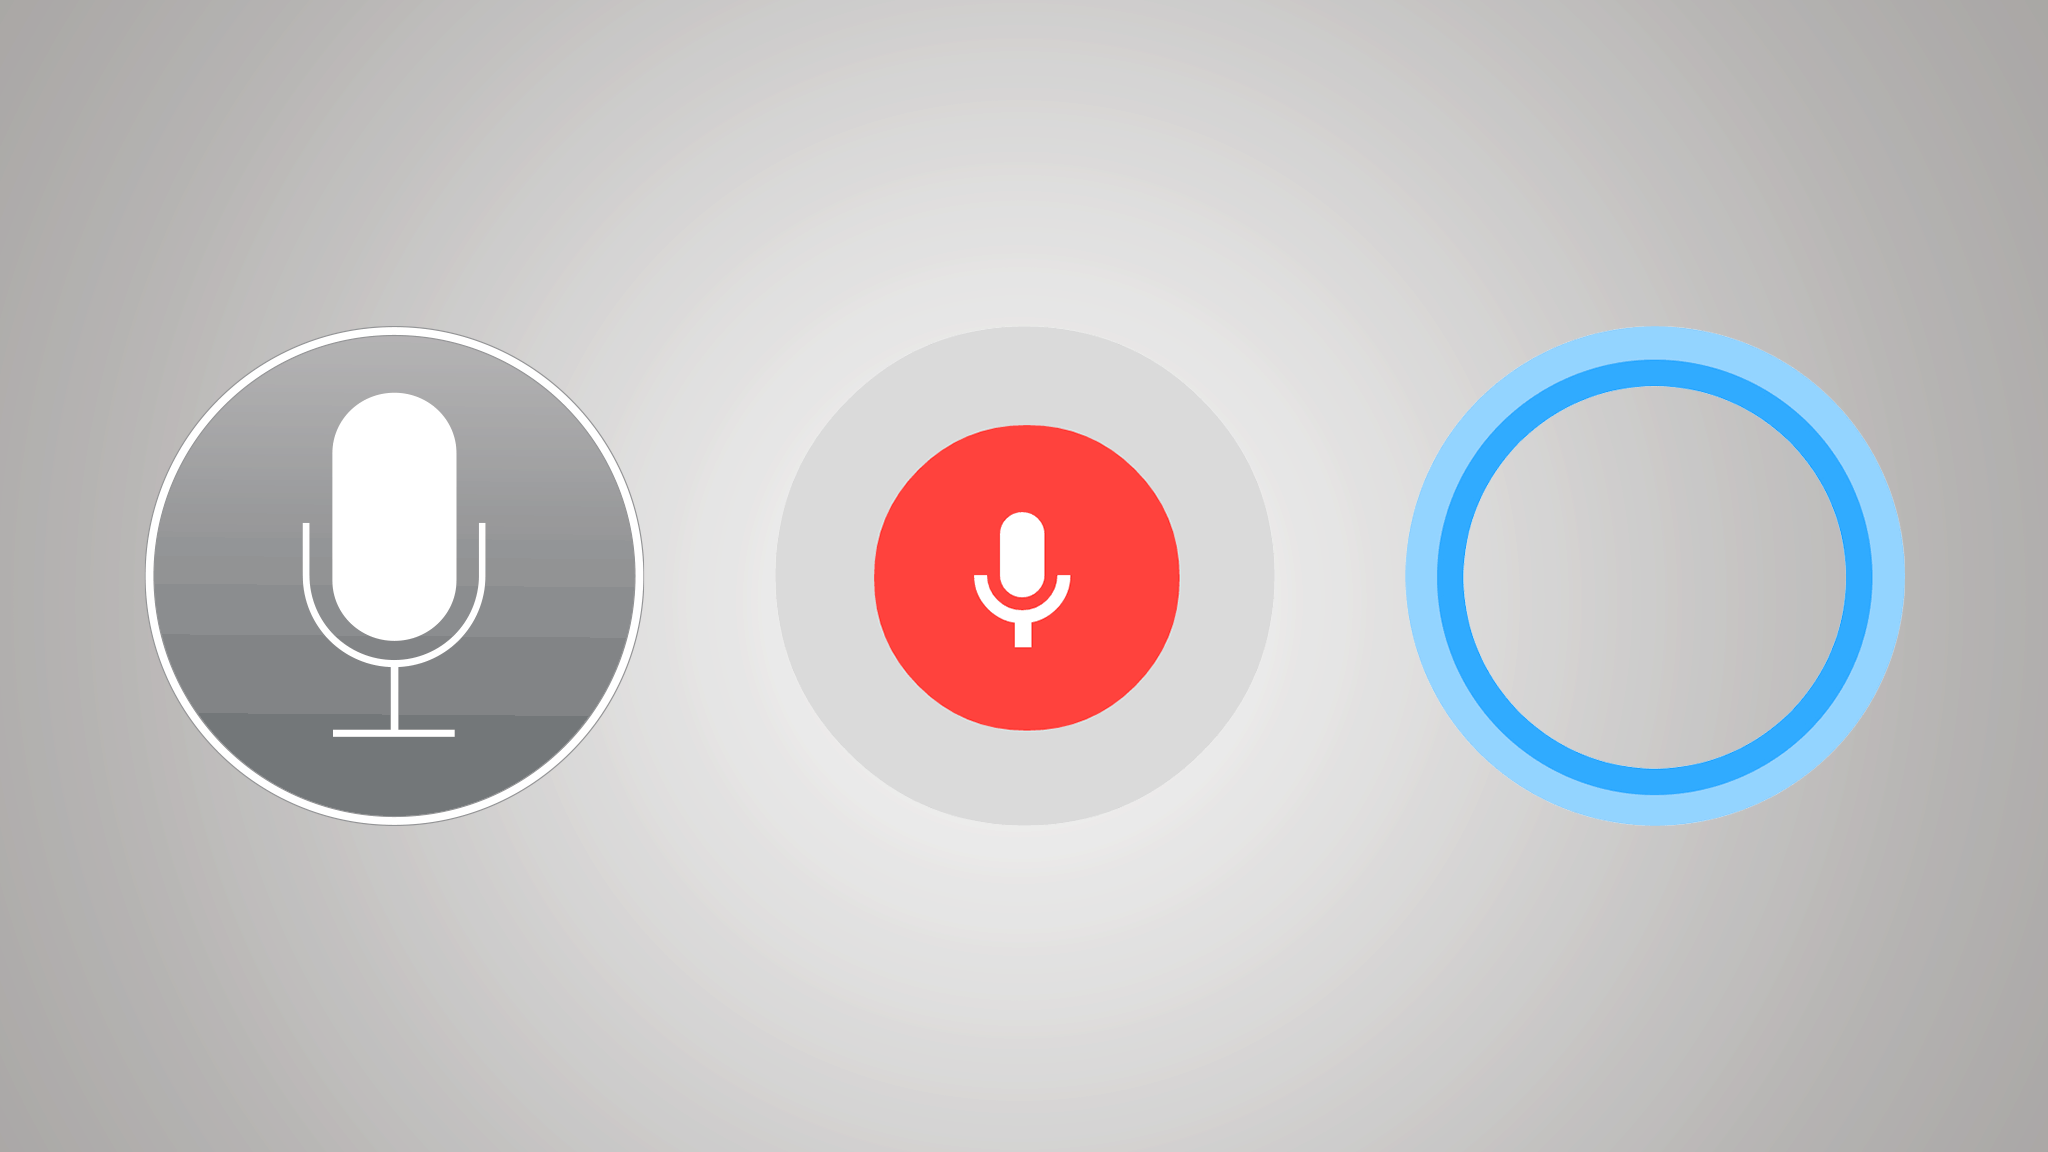 Comparison Between Cortana, Siri, & Google Now